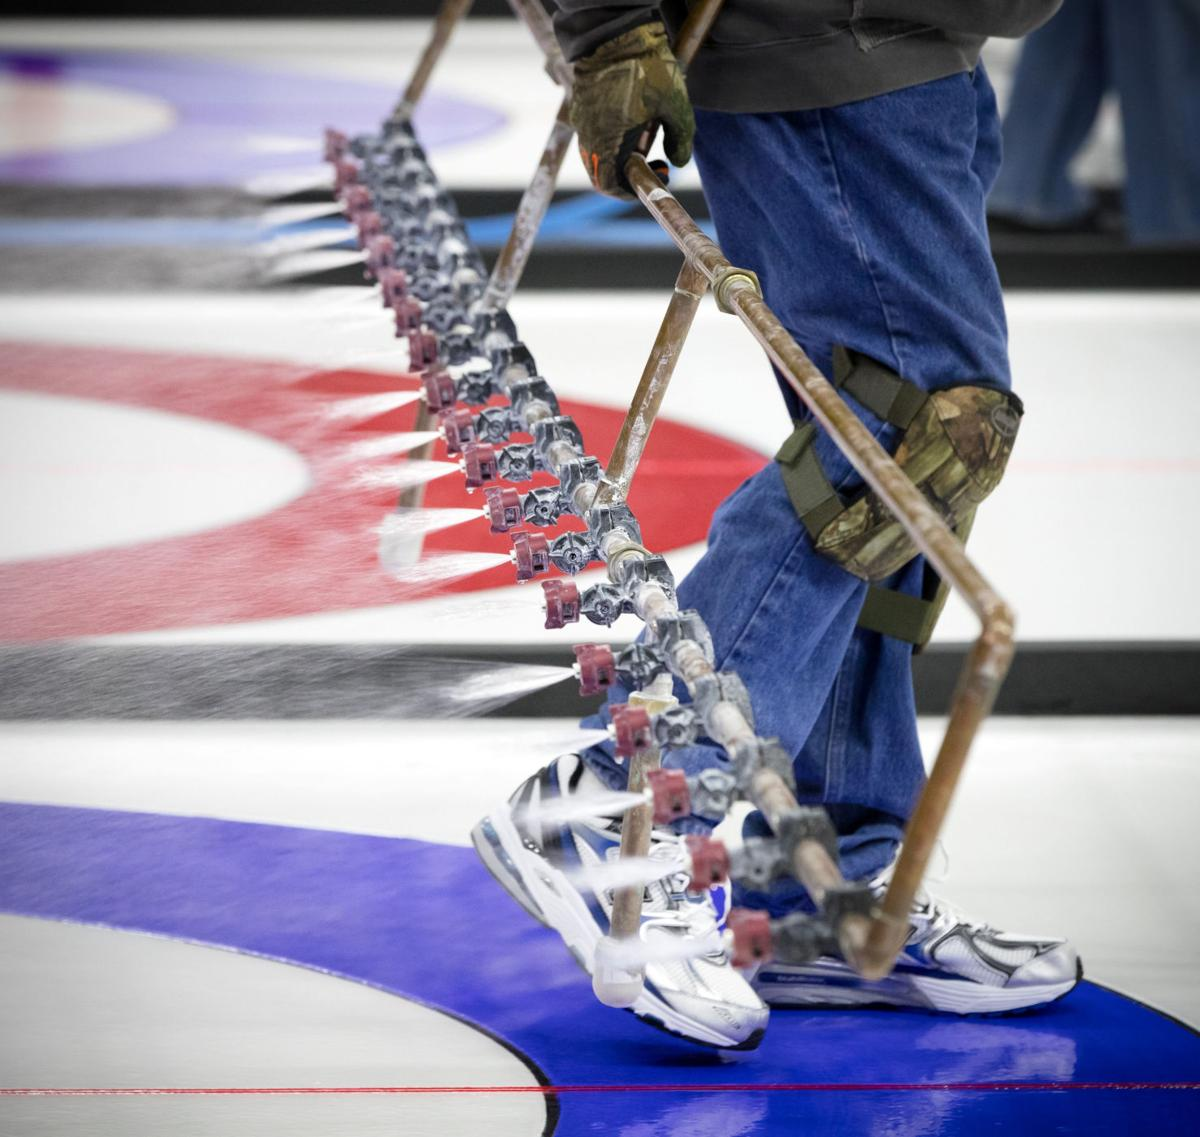 Curling prep